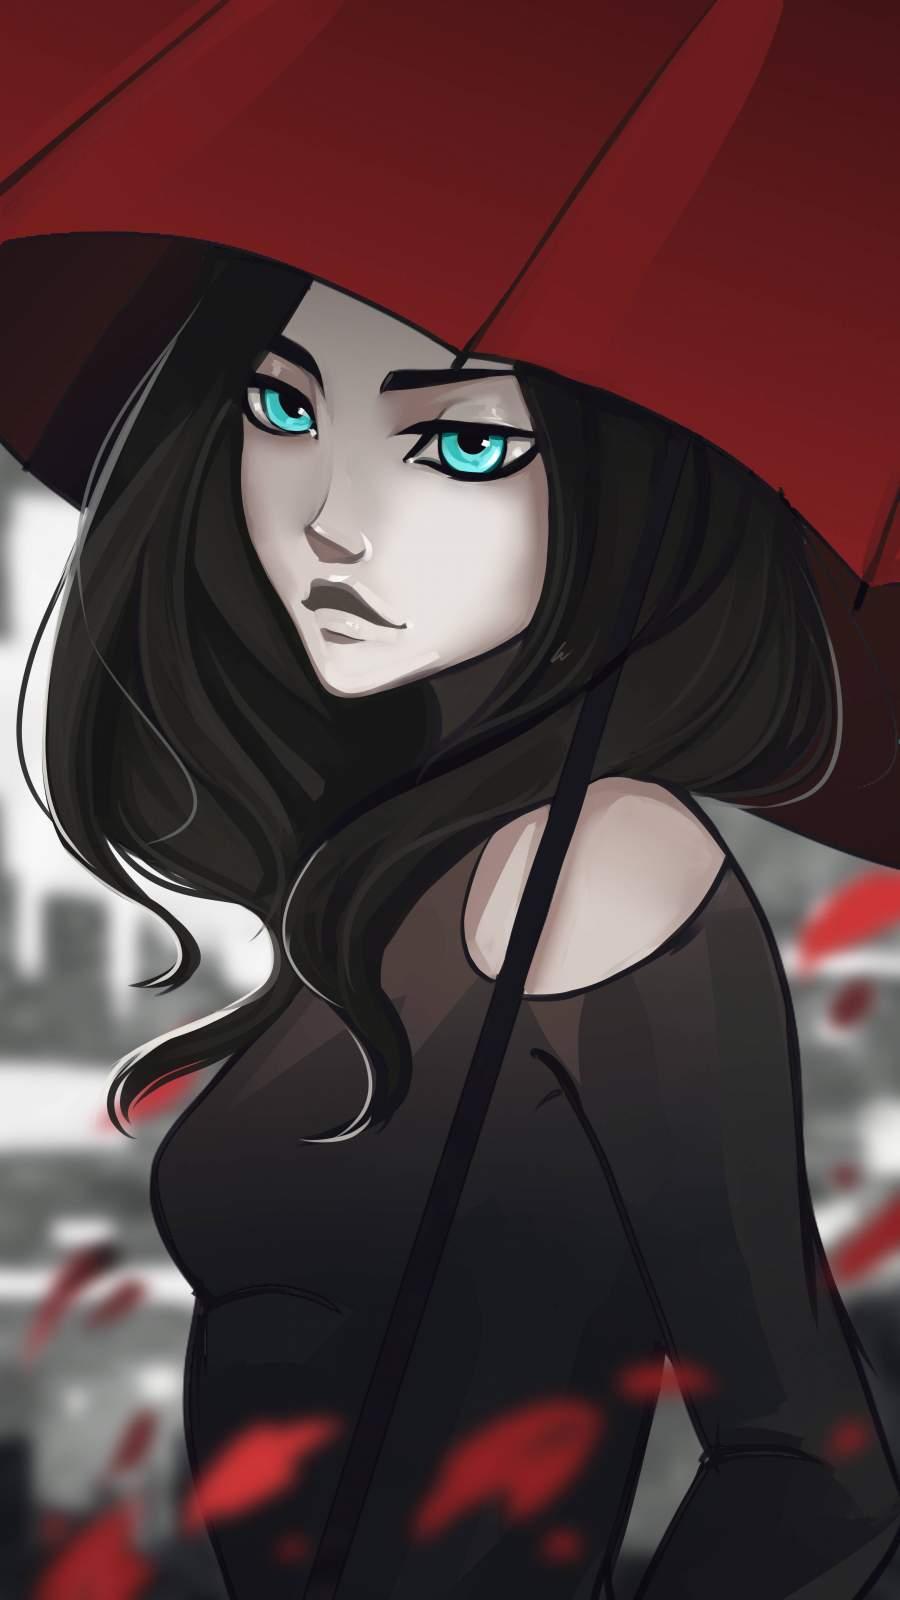 Blue Eyes Anime Girl iPhone Wallpaper